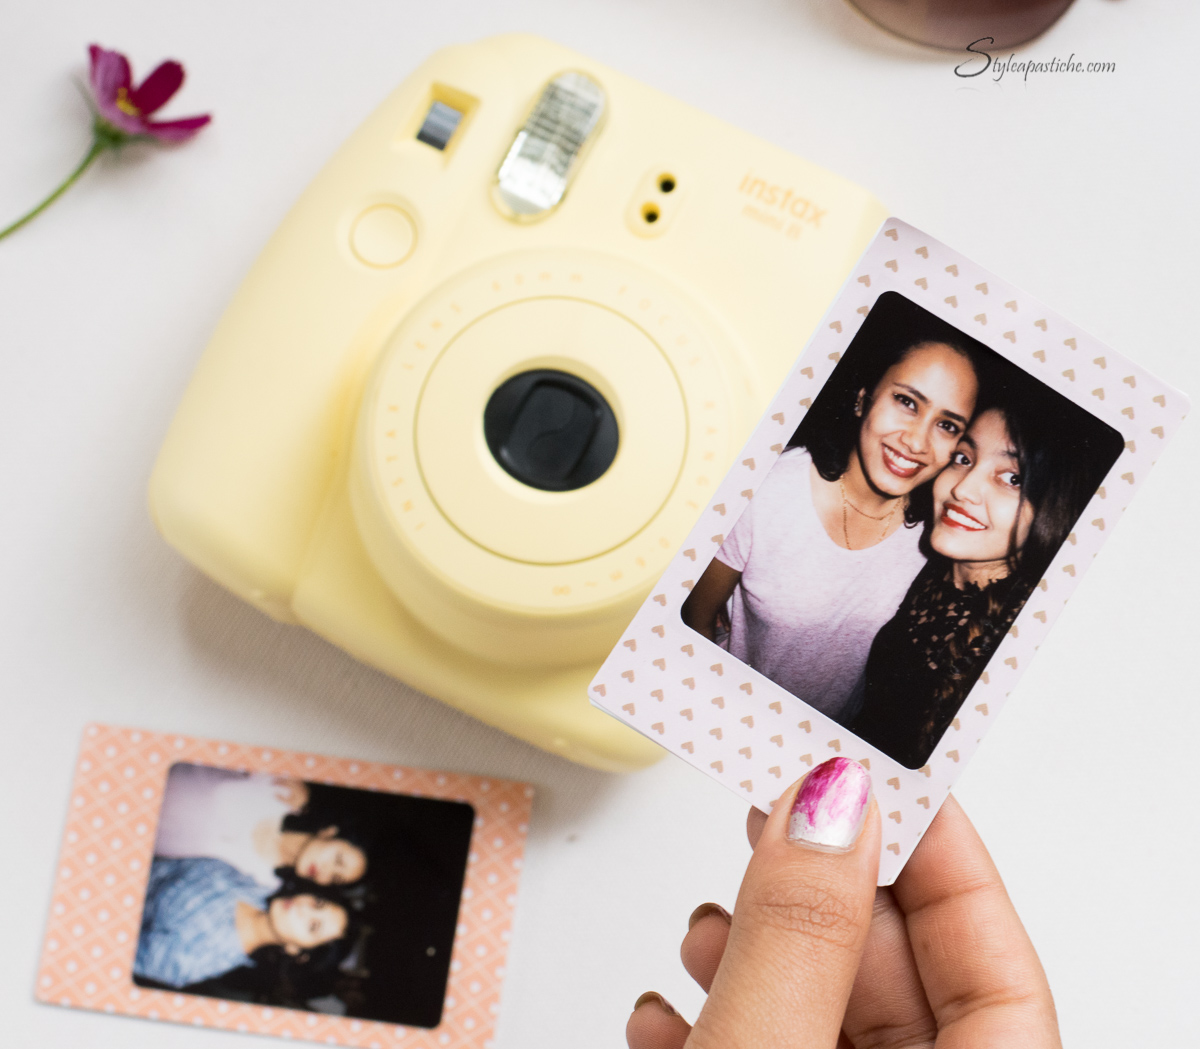 3-Indian-fashion-beauty-lifestyle-blogger-styleapastiche-fujifilm-instax-mini-8-camera-review